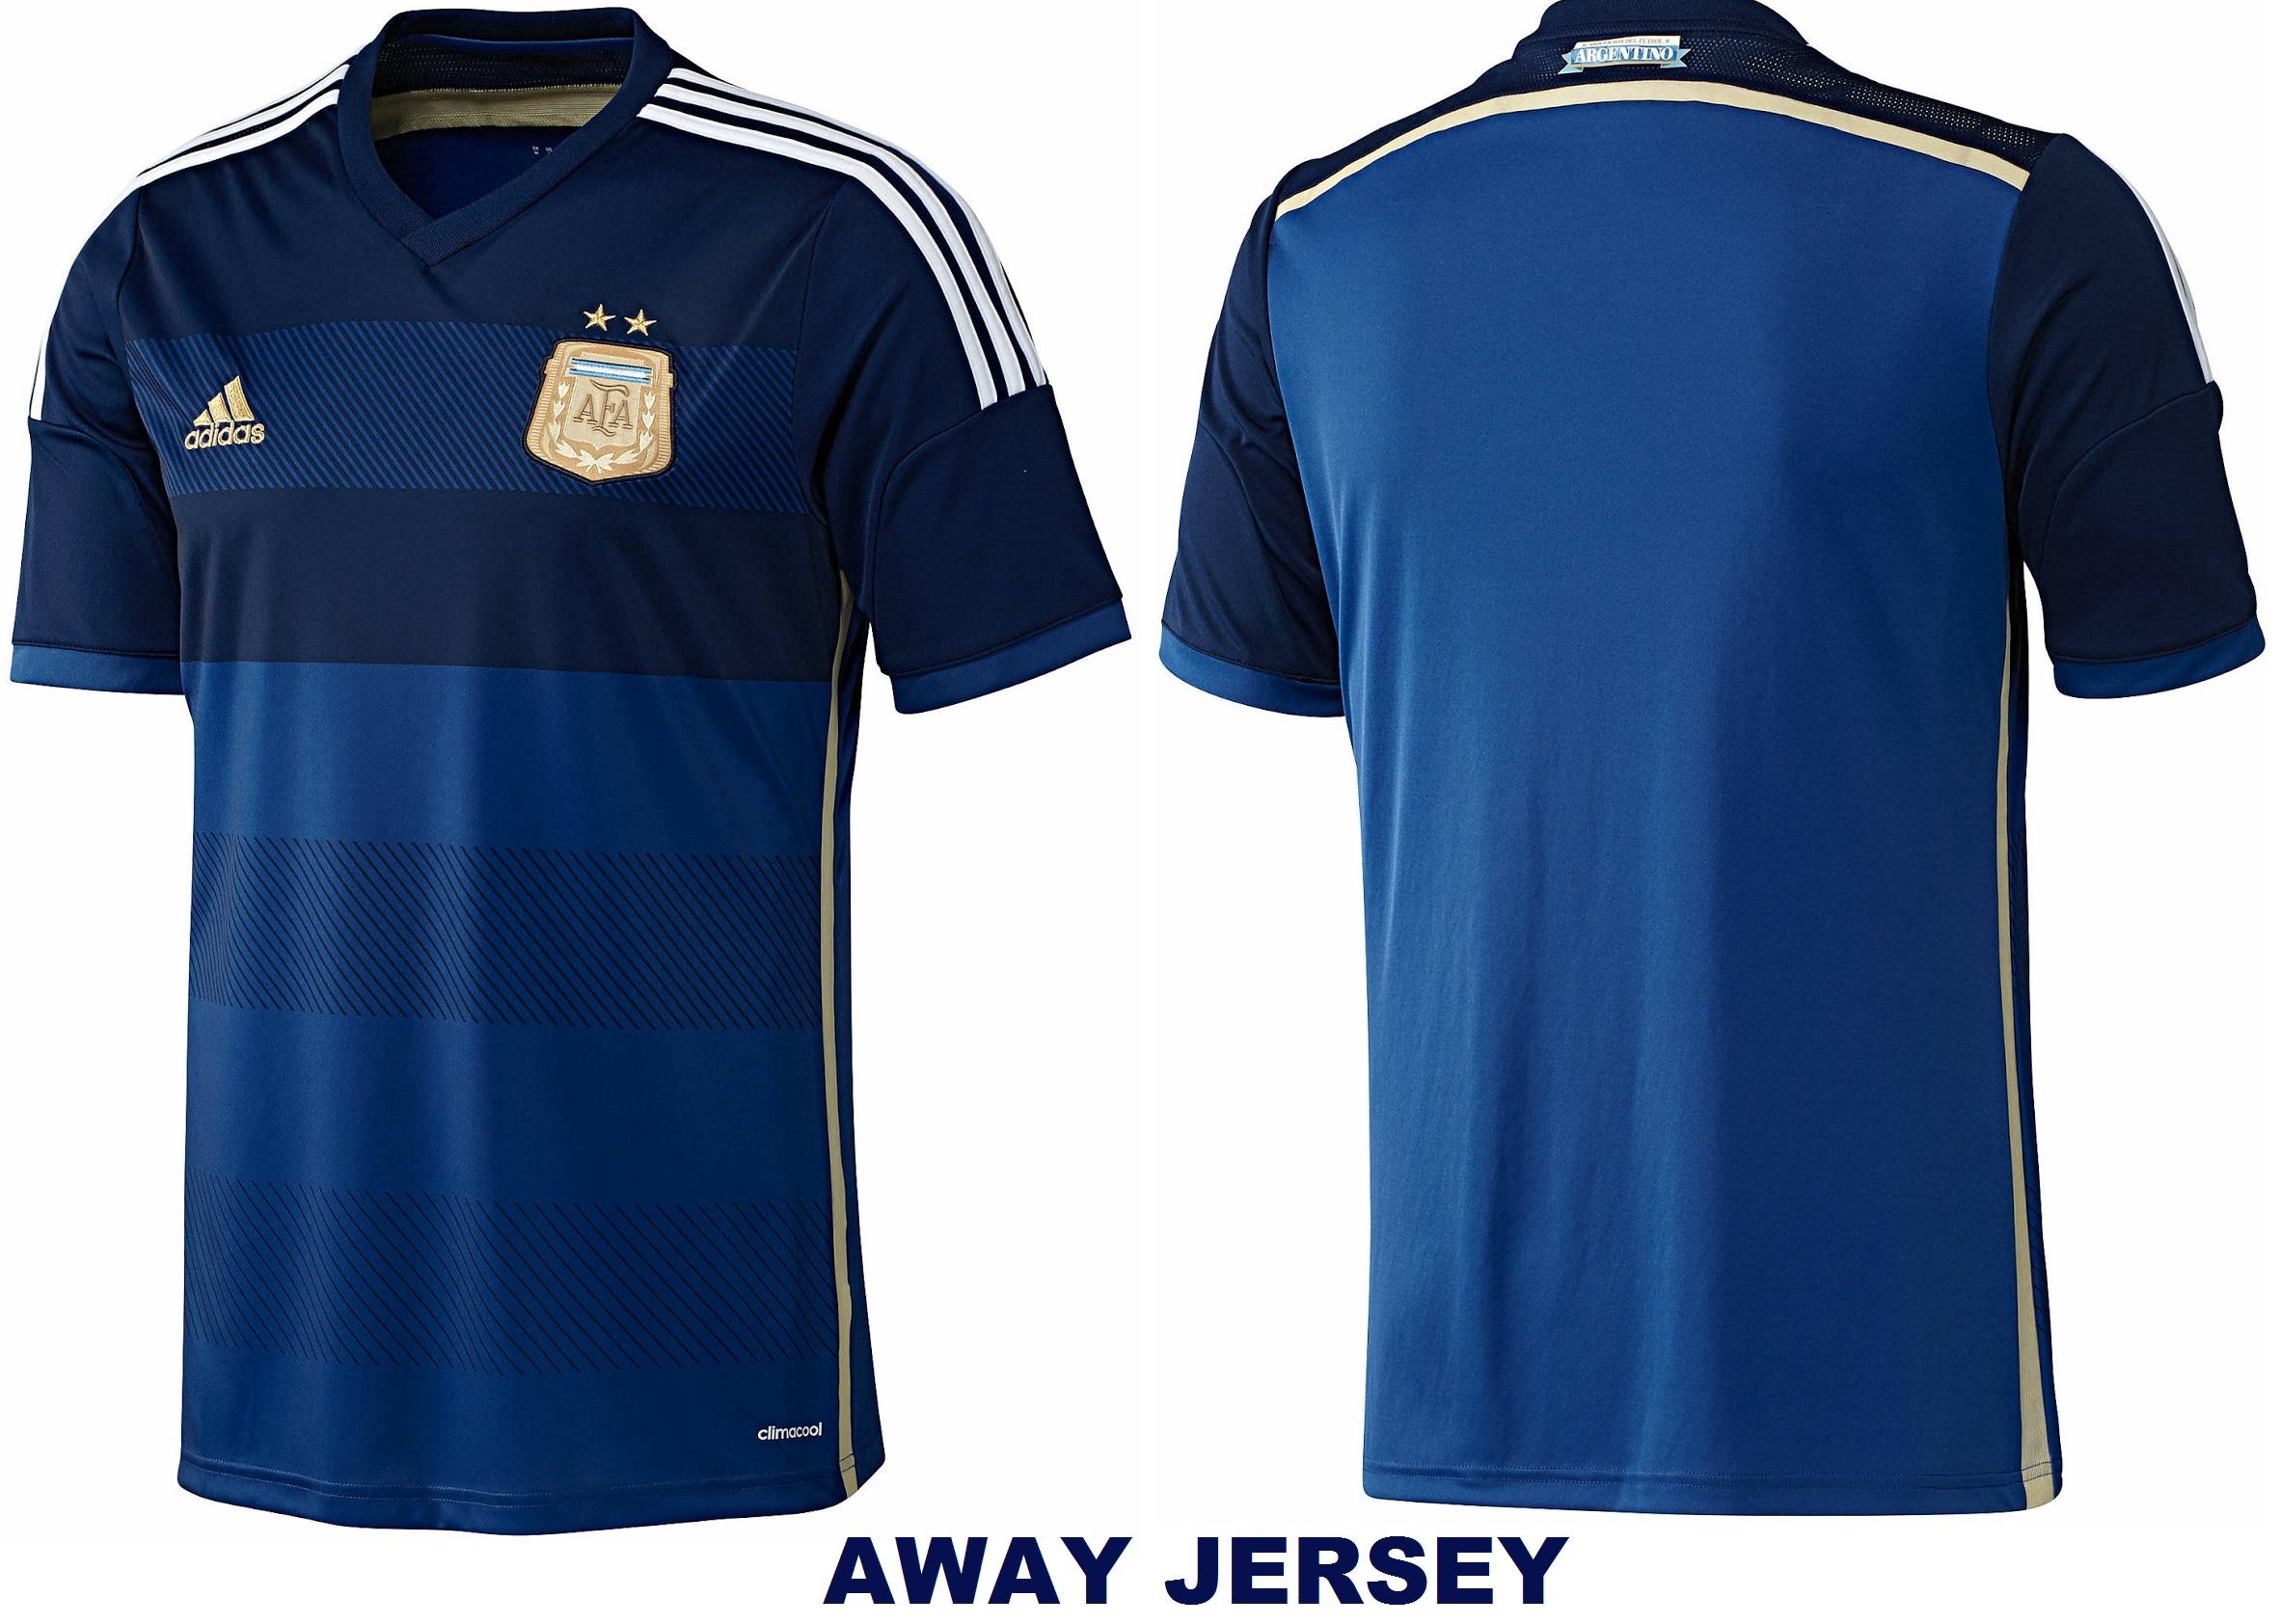 Away Jersey of Argentina